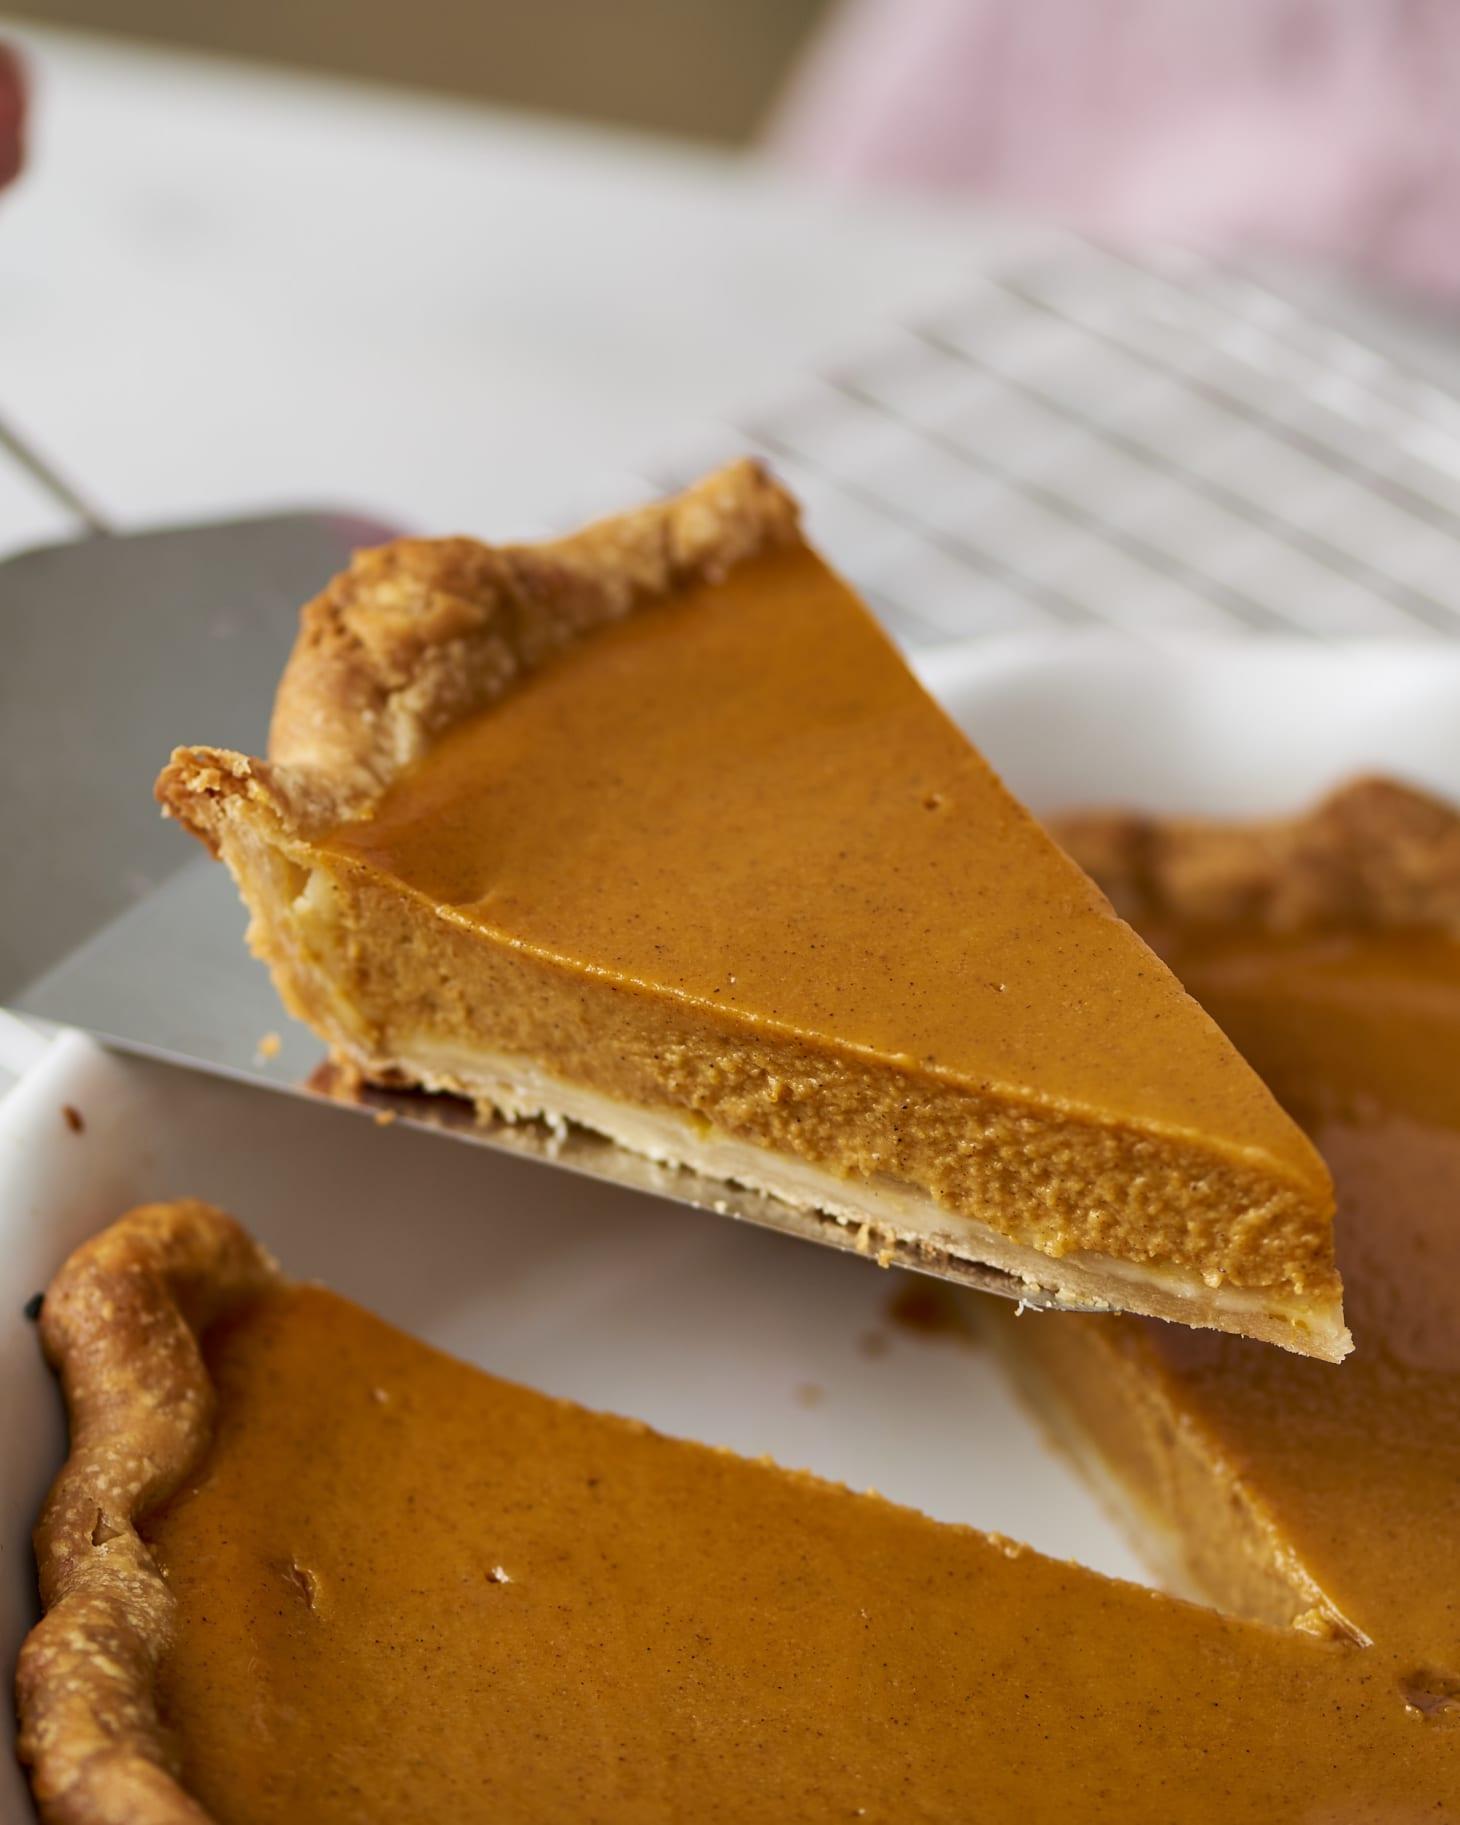 How To Make Homemade Pumpkin Pie From Scratch